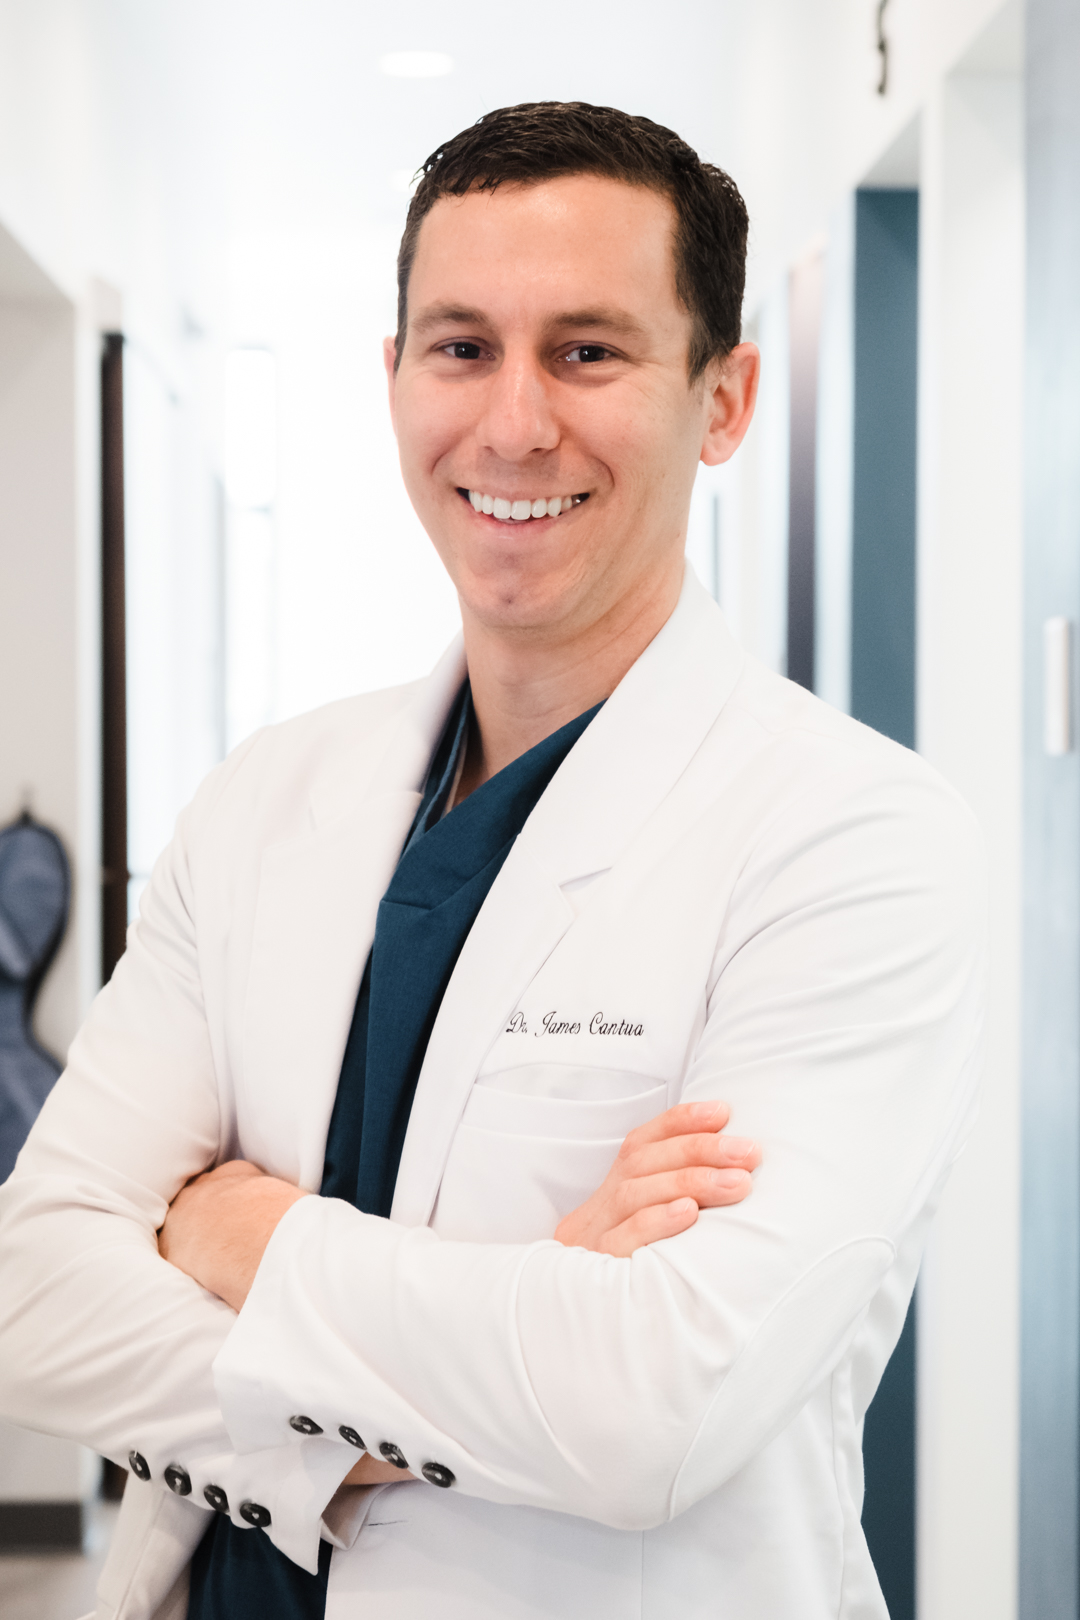 doctor james cantua image